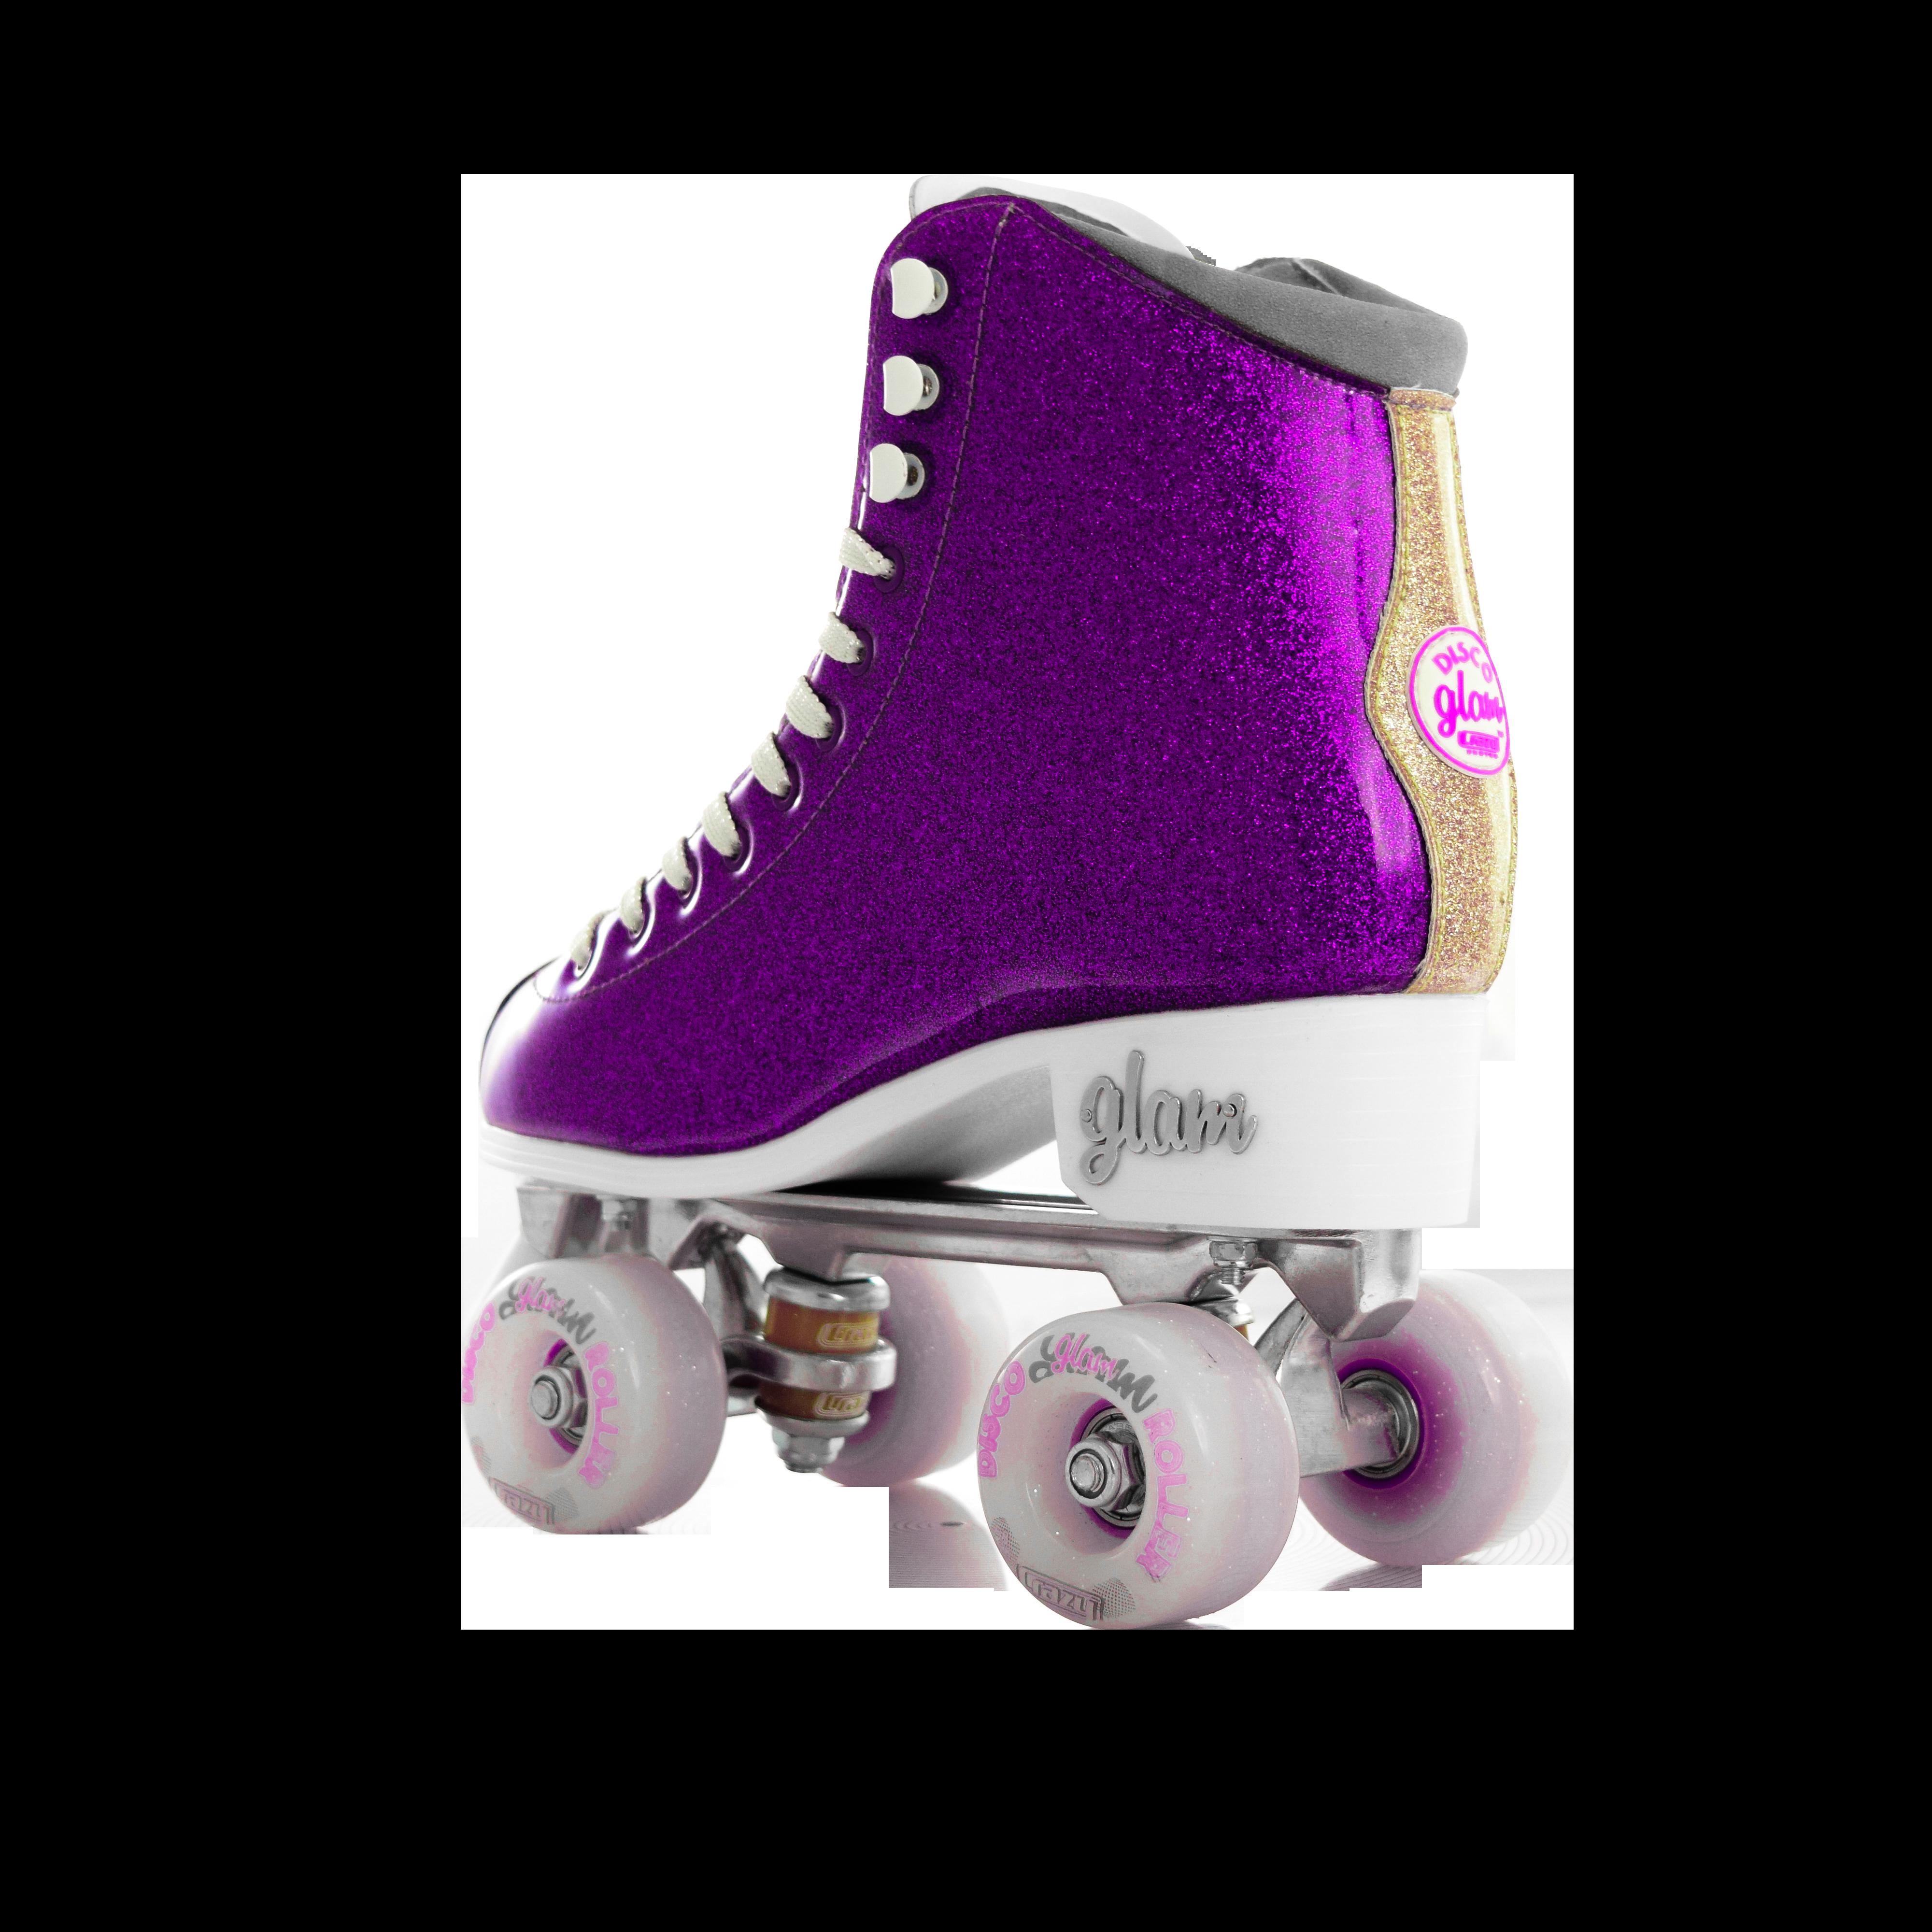 Glam Roller Skates by Crazy SkatesGlitter Quad Rollerskates for GirlsPink